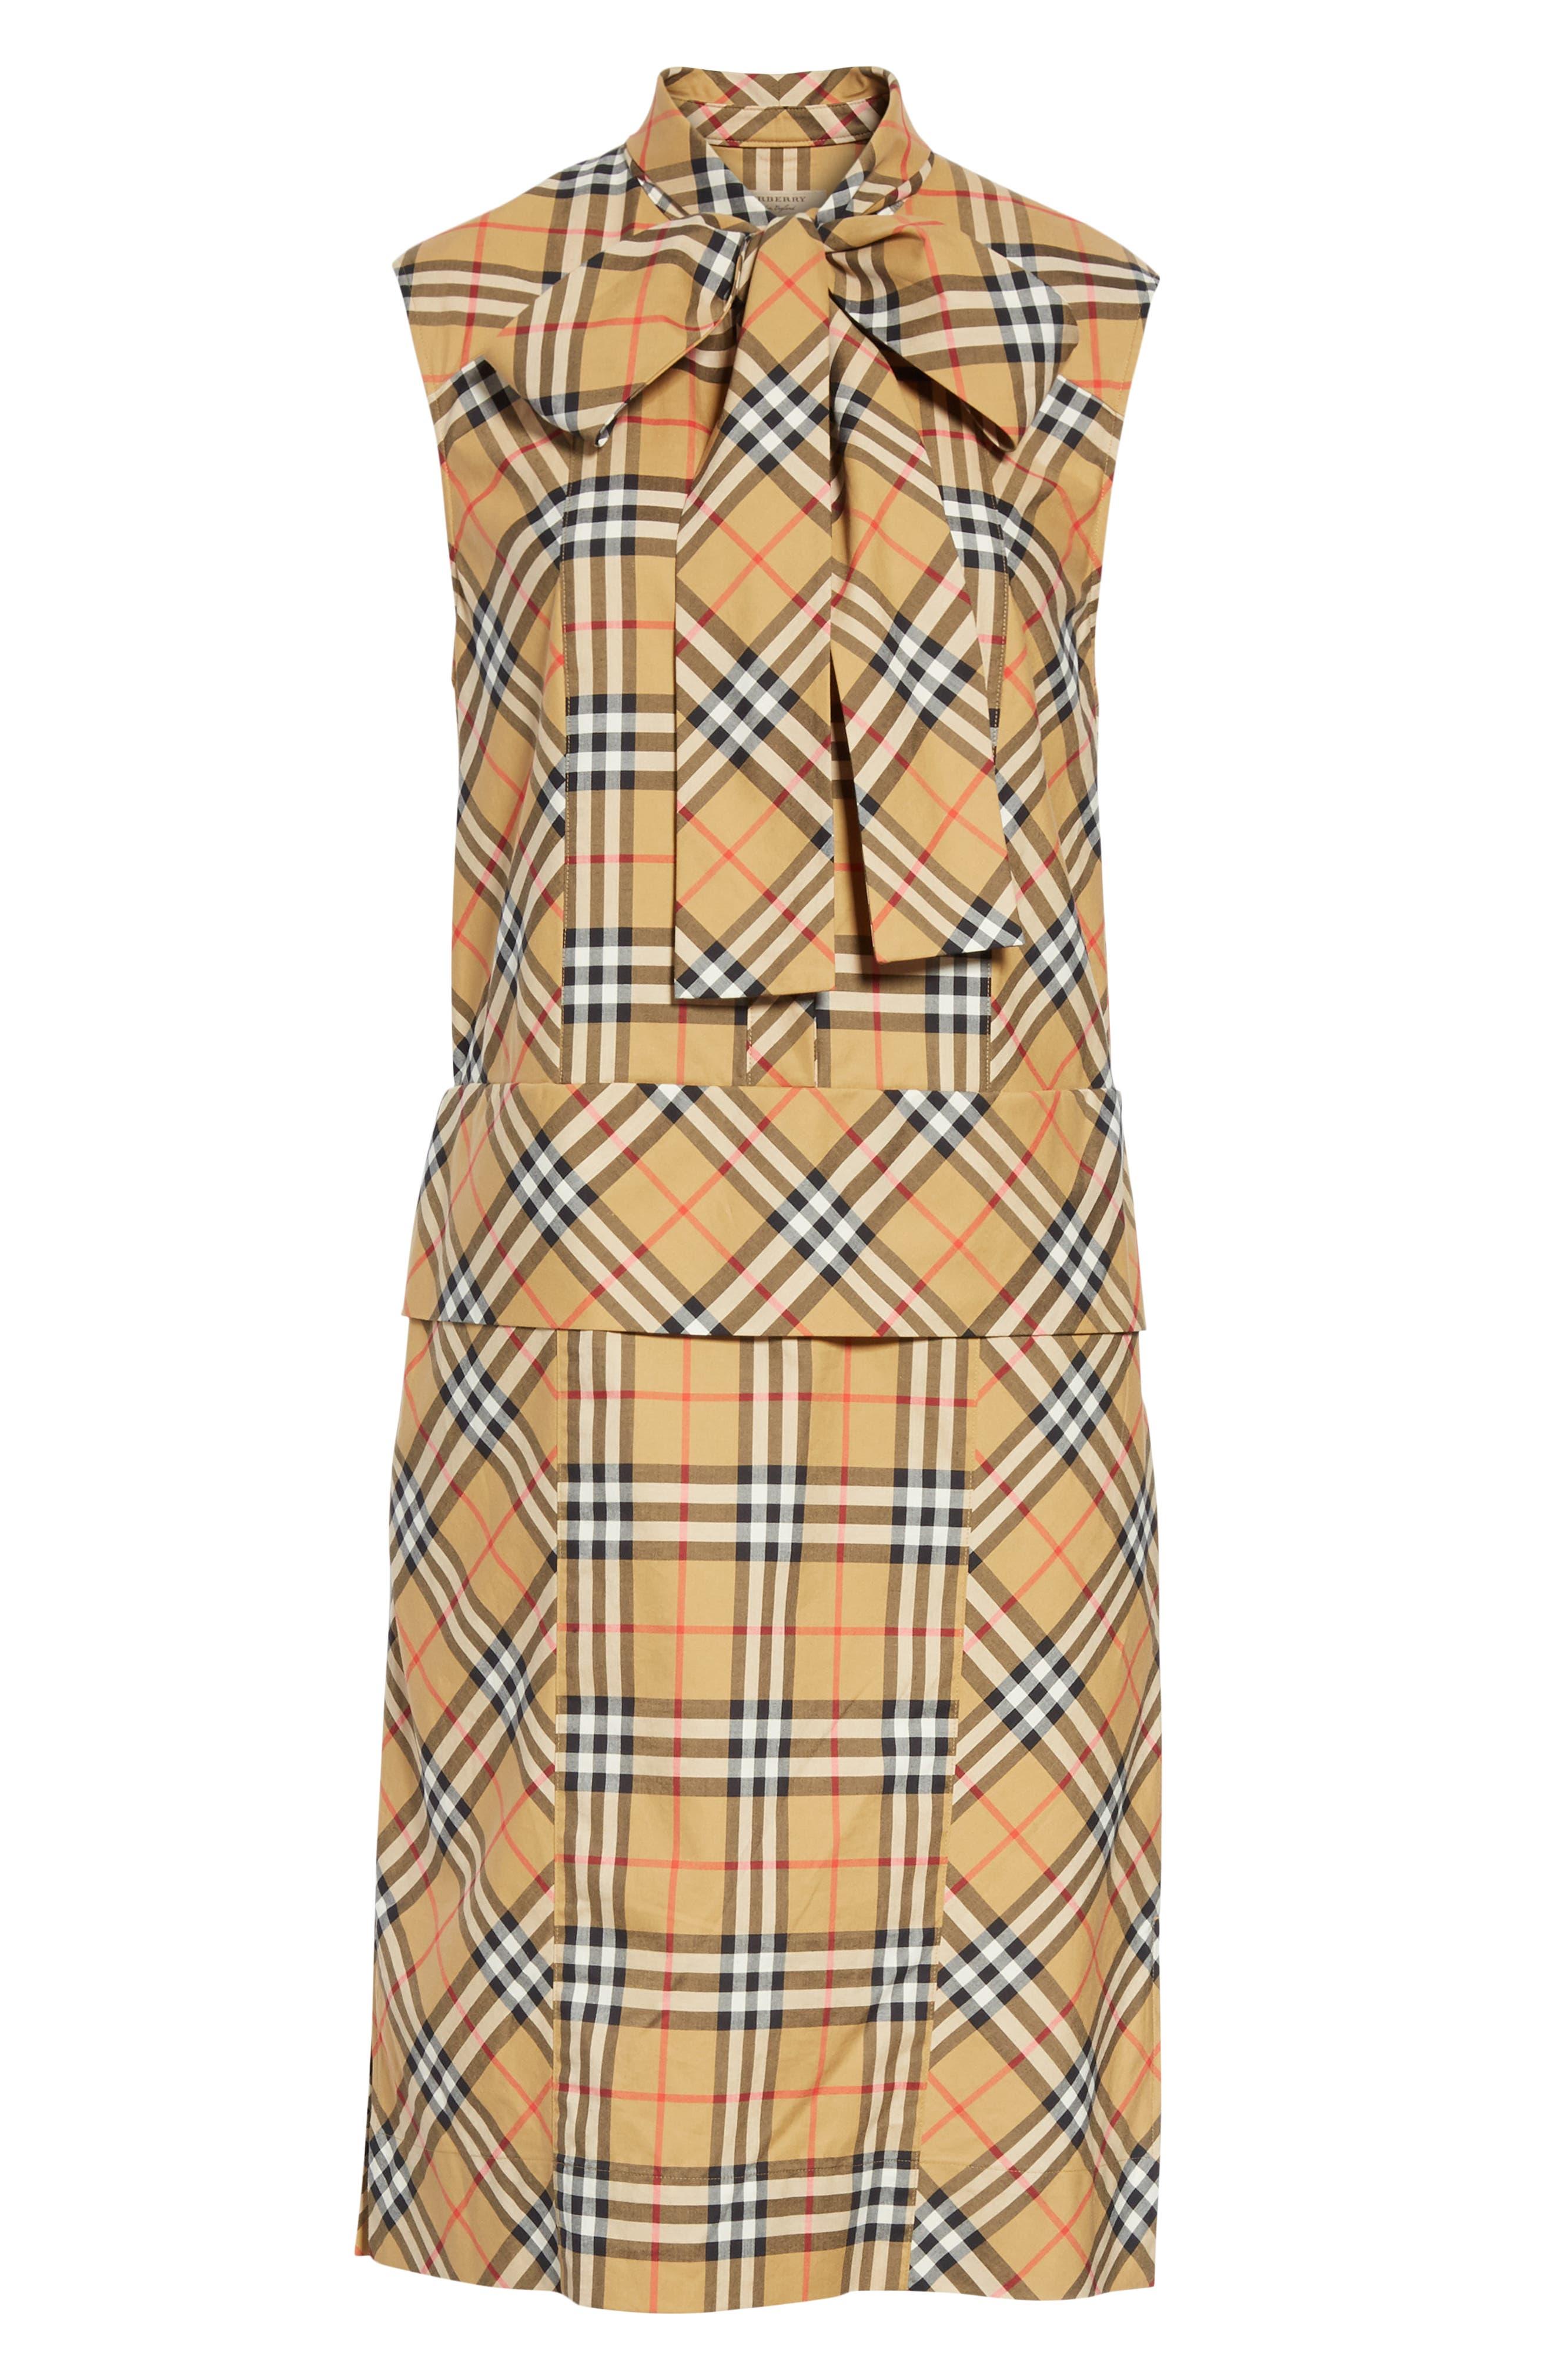 Luna Tie Neck Check Dress,                             Alternate thumbnail 6, color,                             ANTIQUE YELLOW CHECK